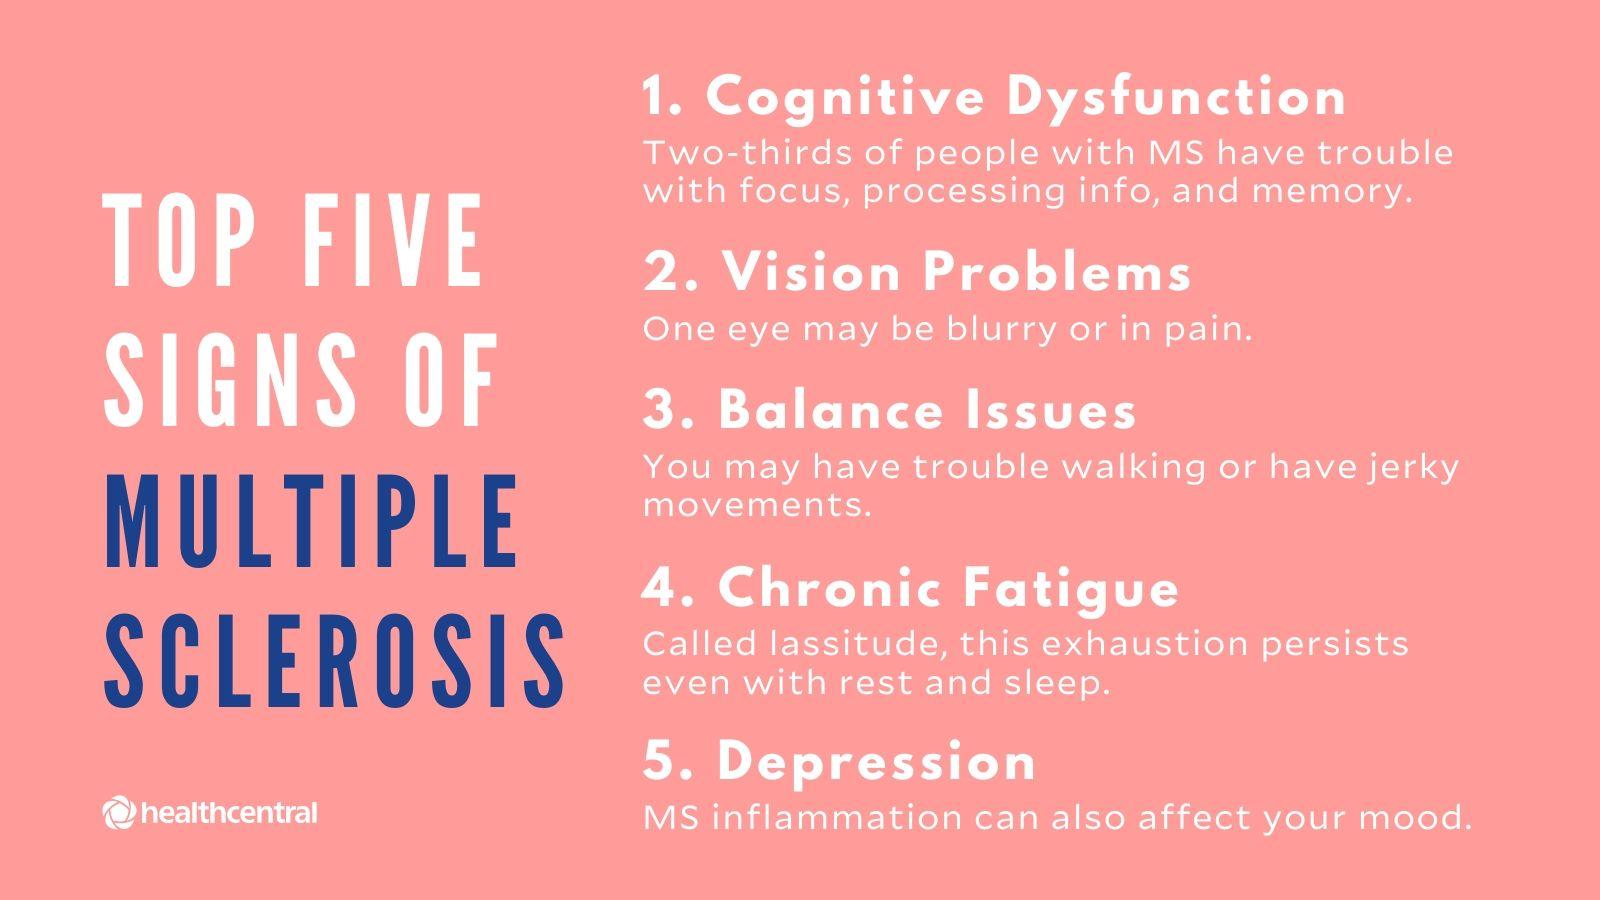 multiple sclerosis diagnosis 57 módon lehet lefogyni